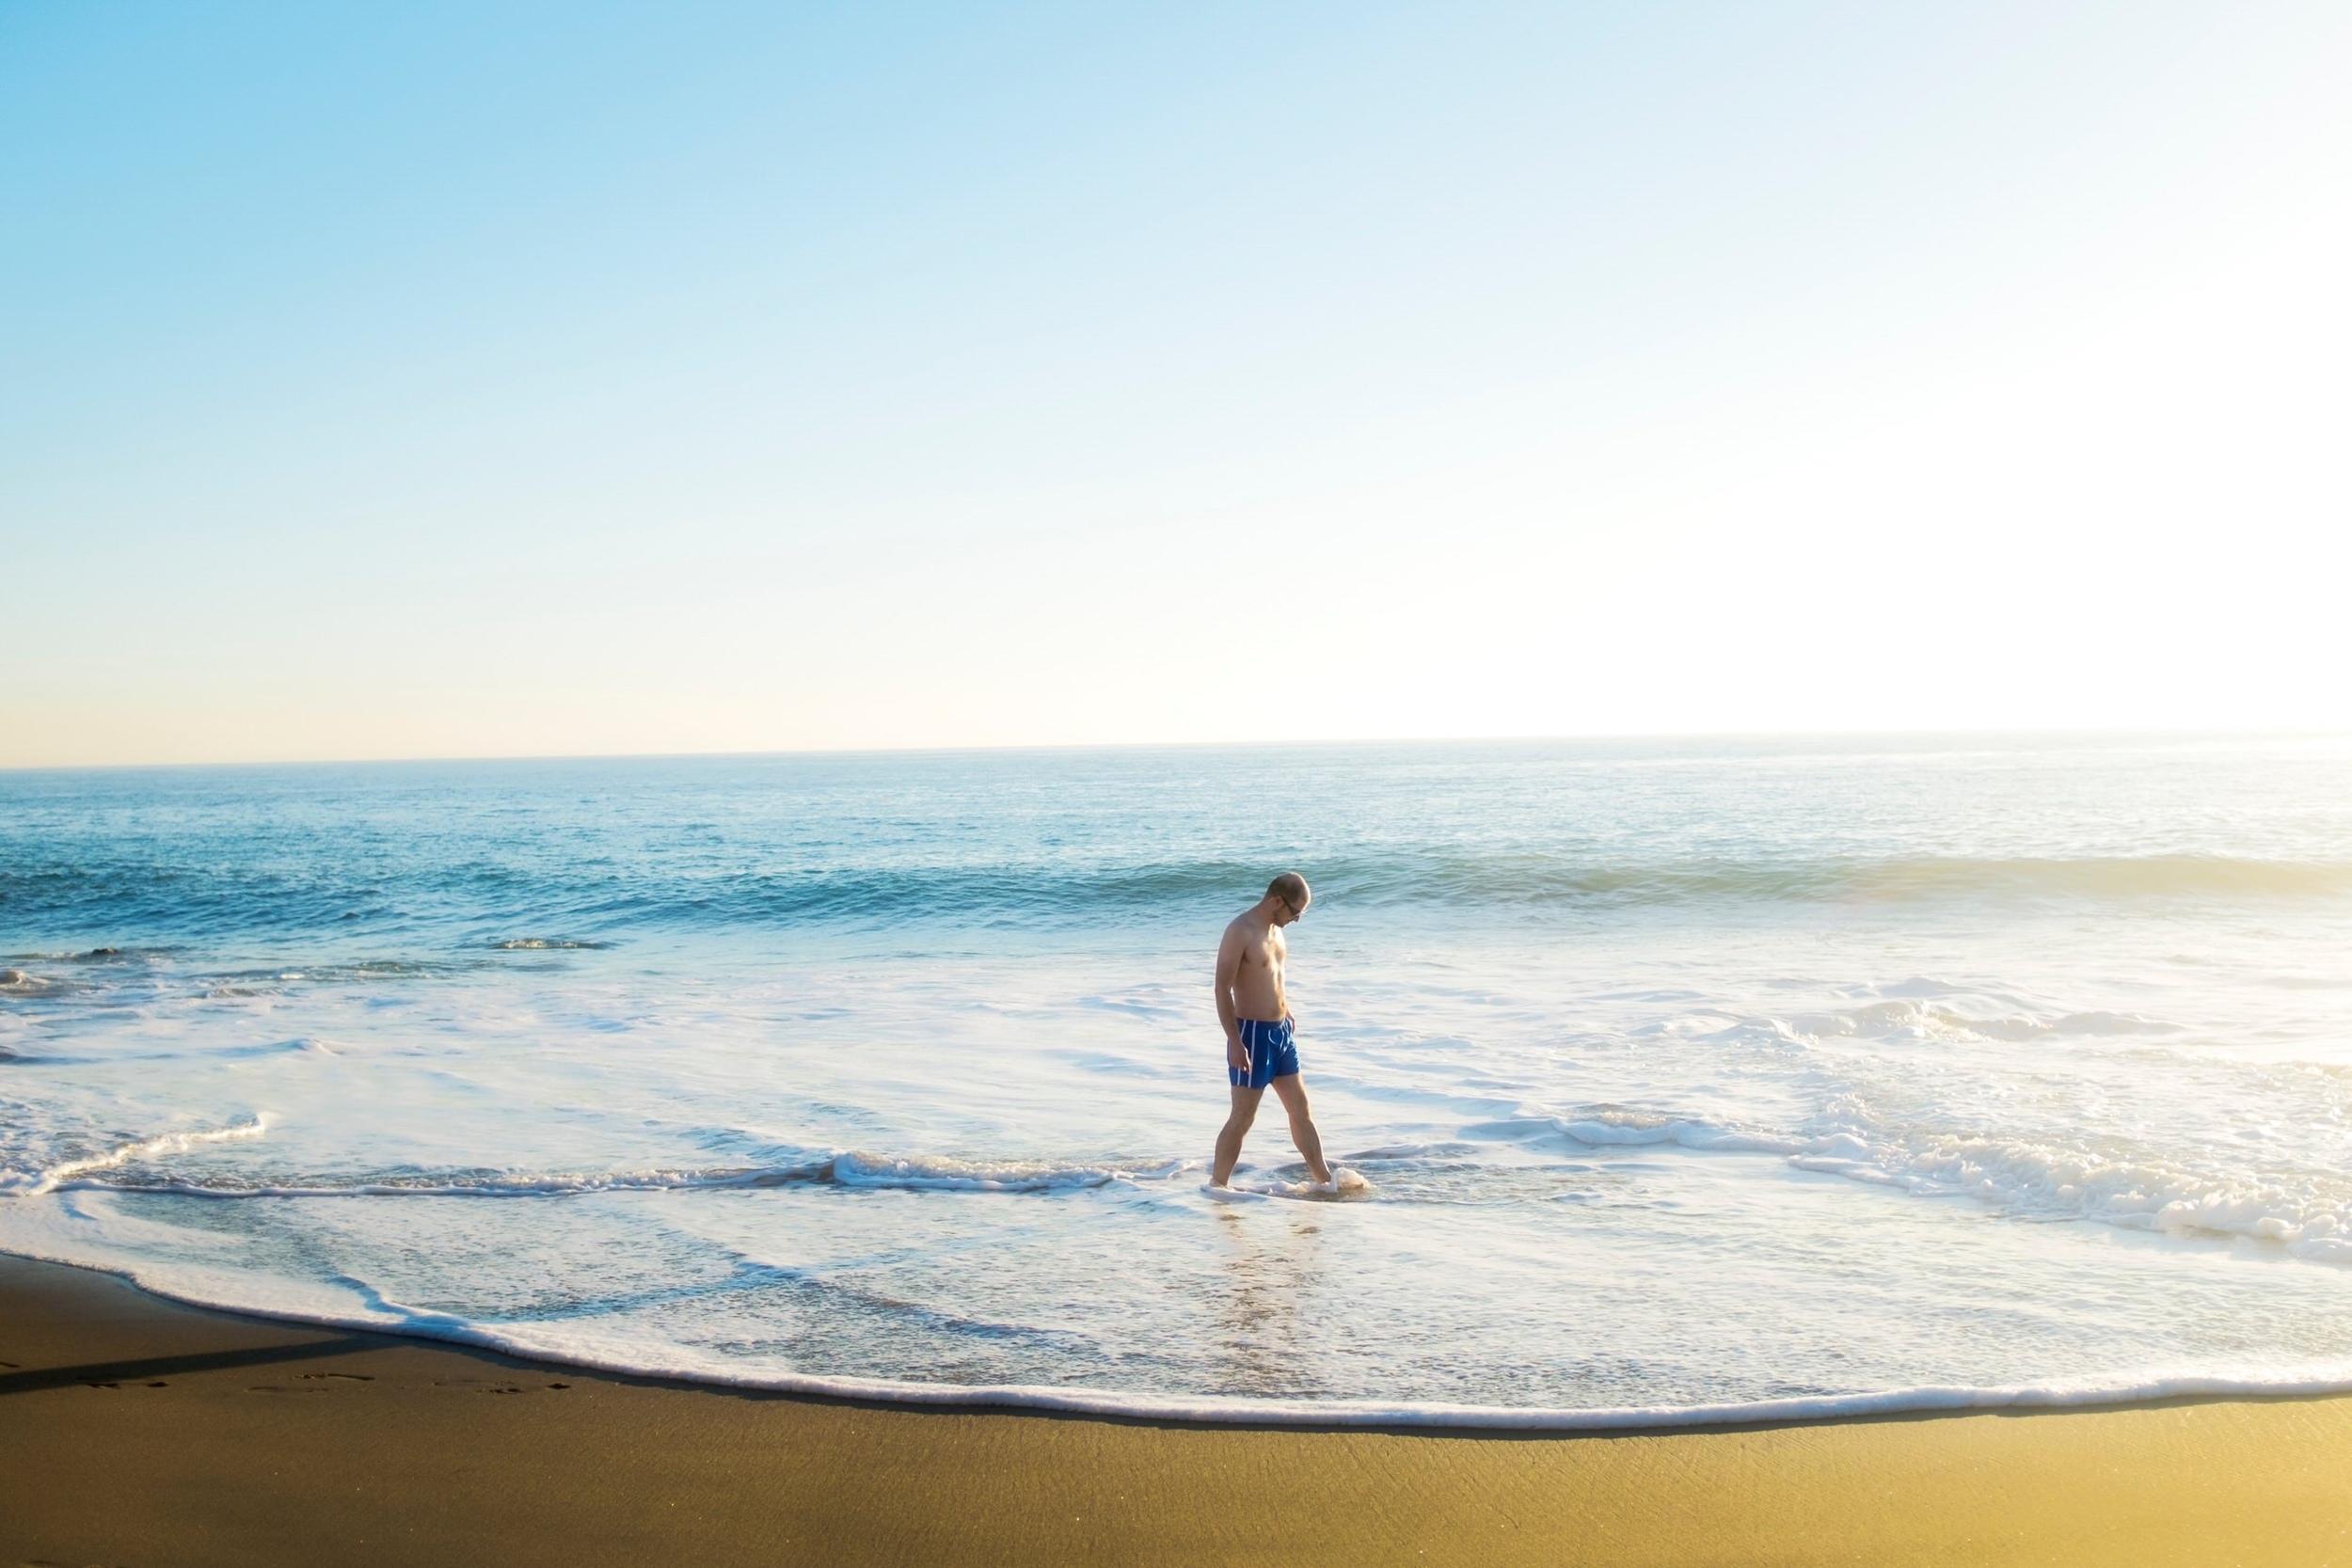 man-walks-aling-leo-carillo-beach-on-a-warm-thanksgiving-day-in-malibu.jpg